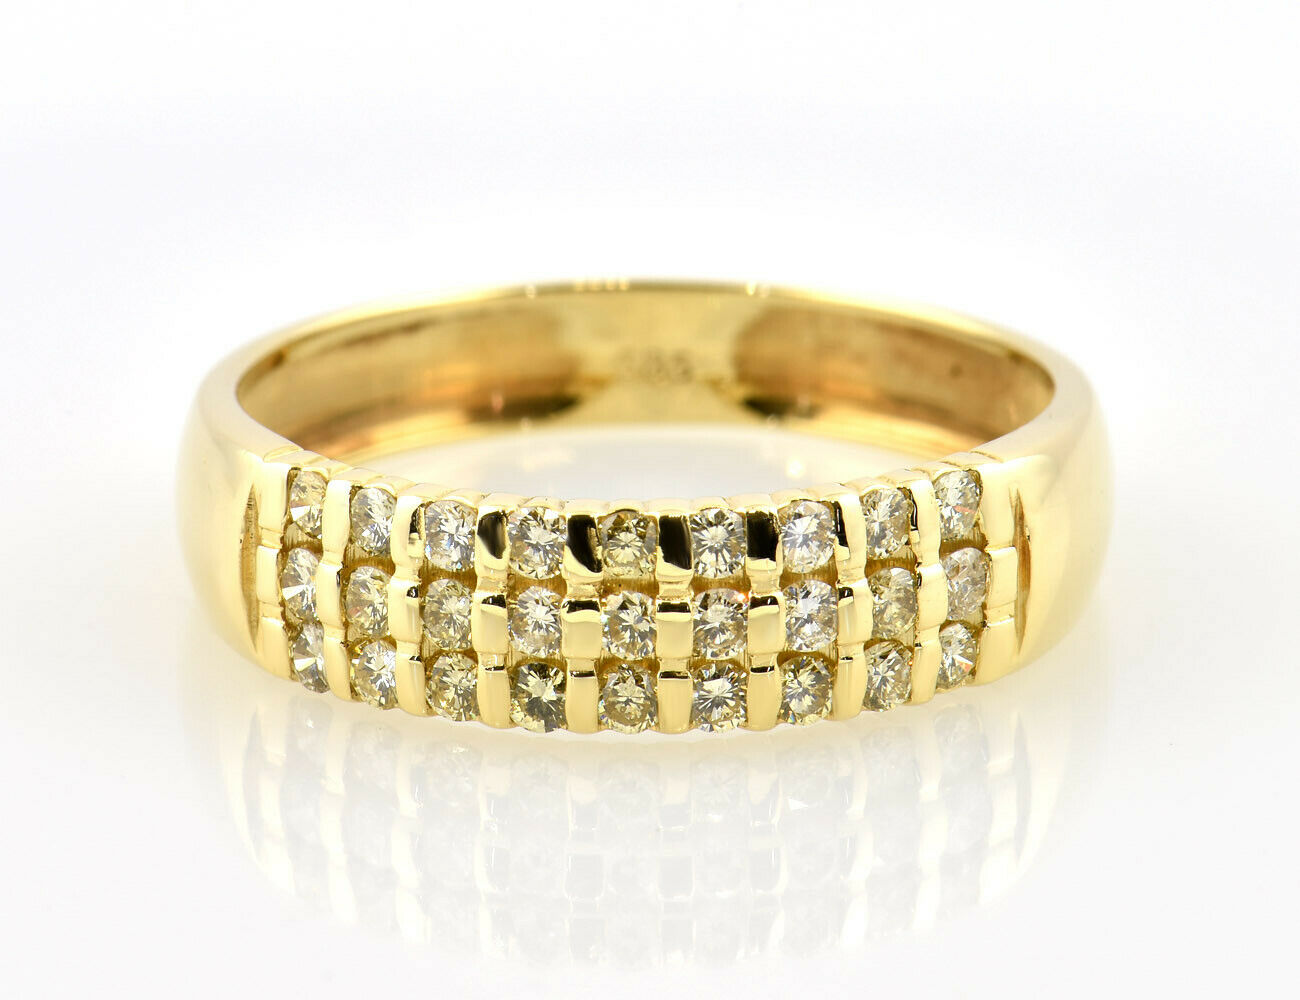 Ring Diamant 585/000 14 K Gelbgold 27 Brillanten zus. 0,40 ct